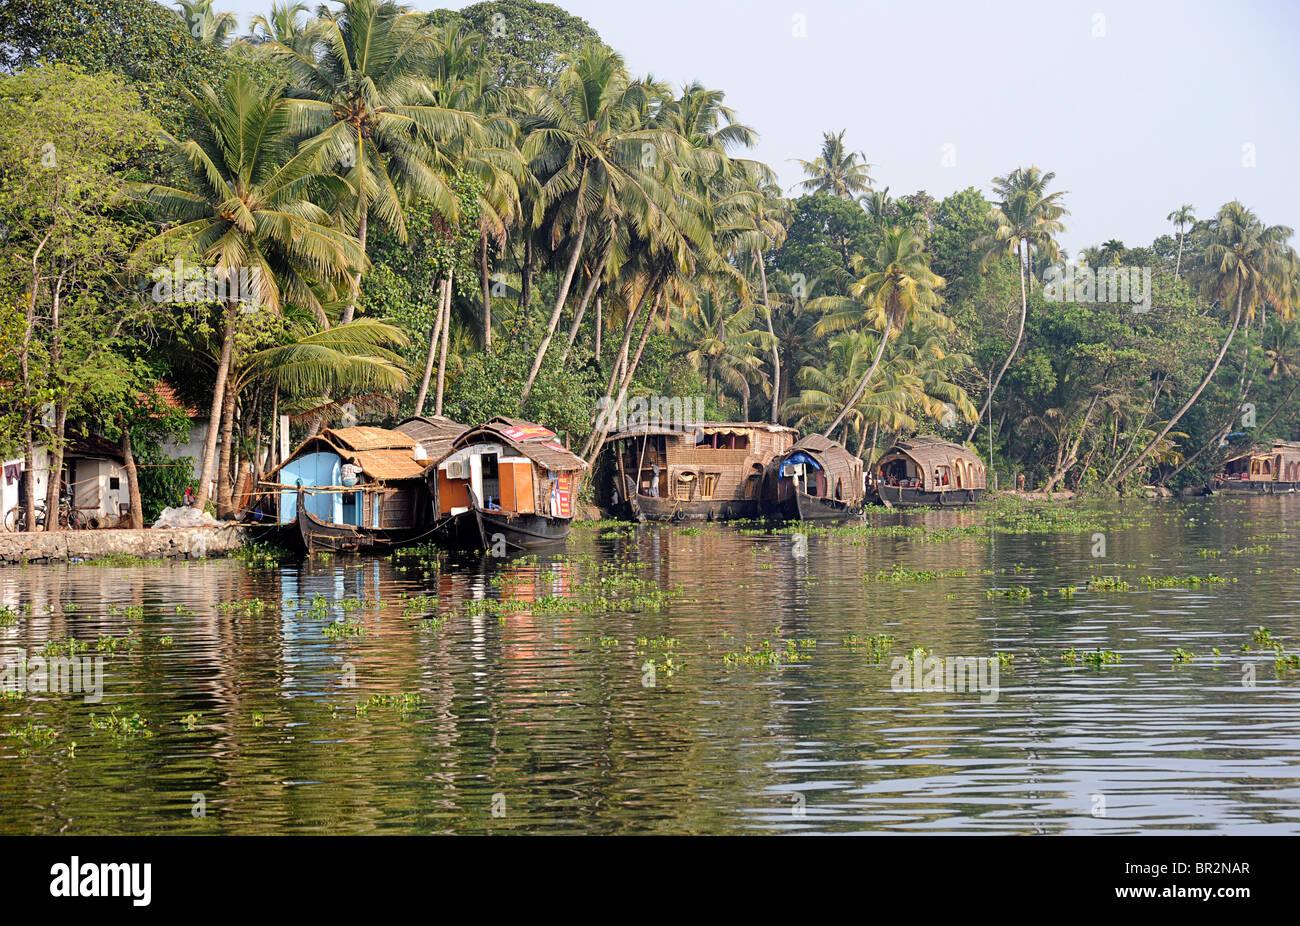 Tranquille lagune di Alleppey, Kerala, India Immagini Stock